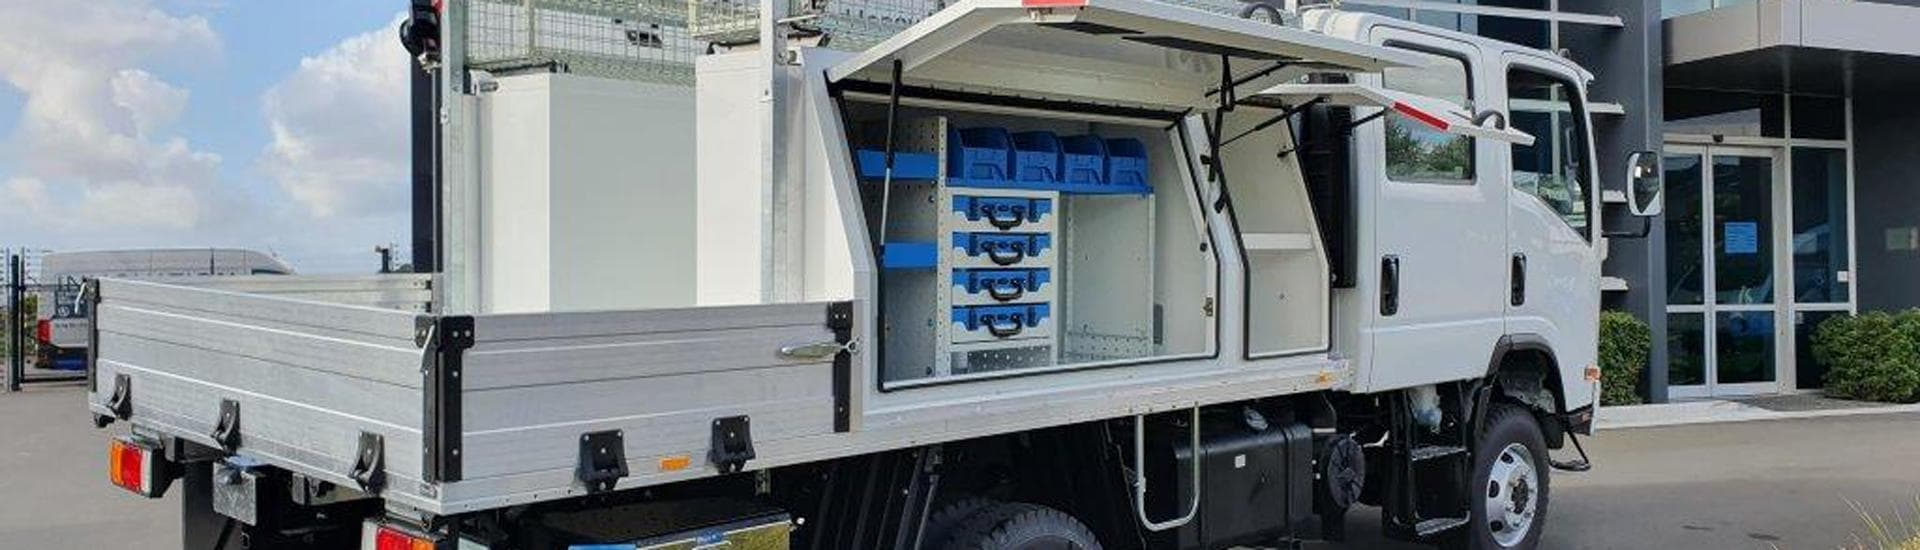 truck main_1920x550 1